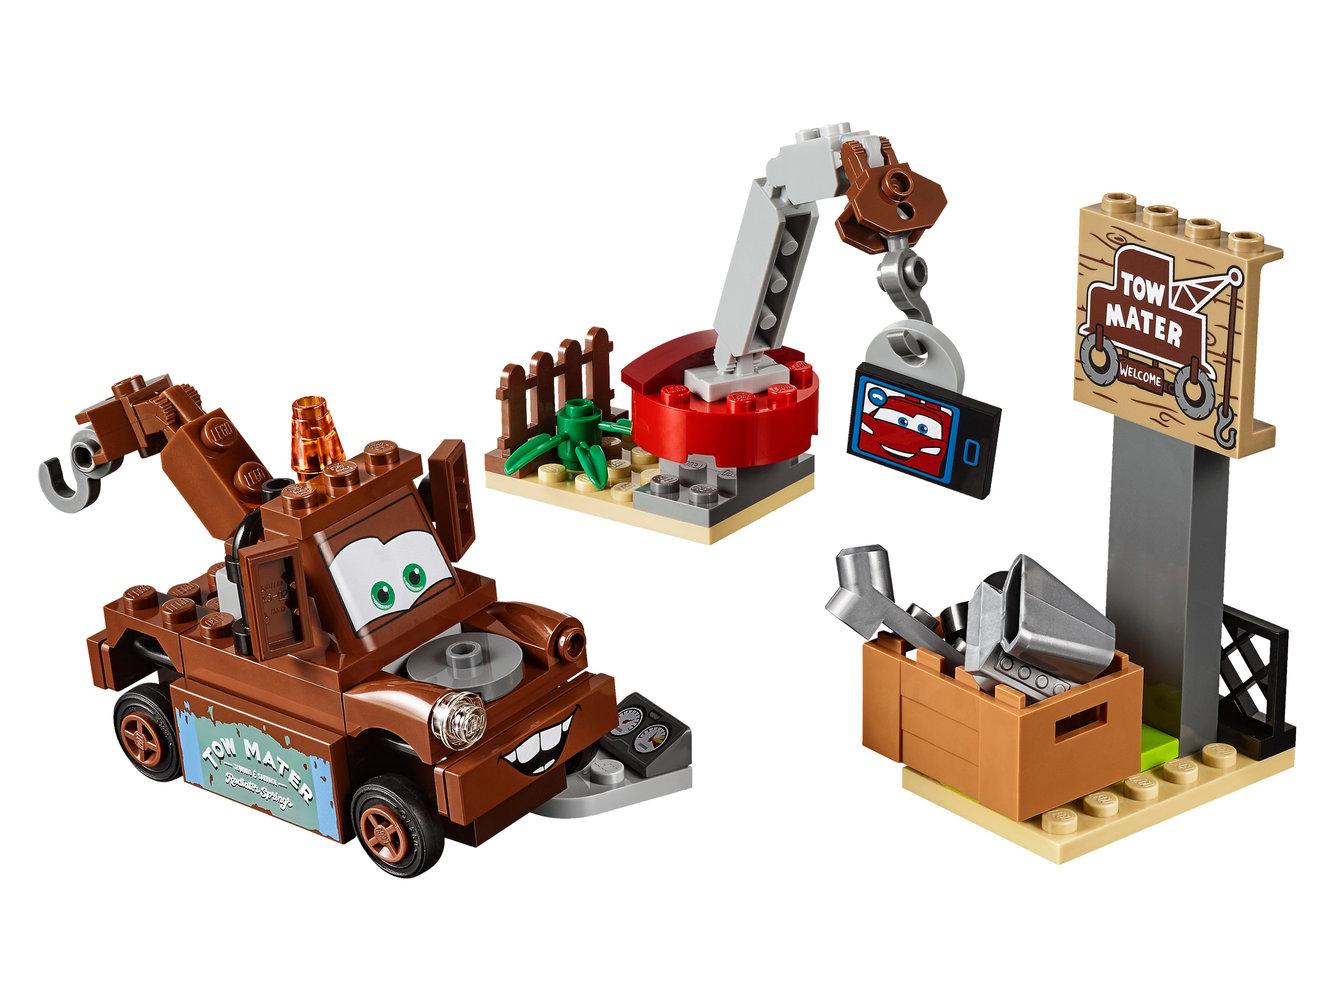 Mater's Junkyard